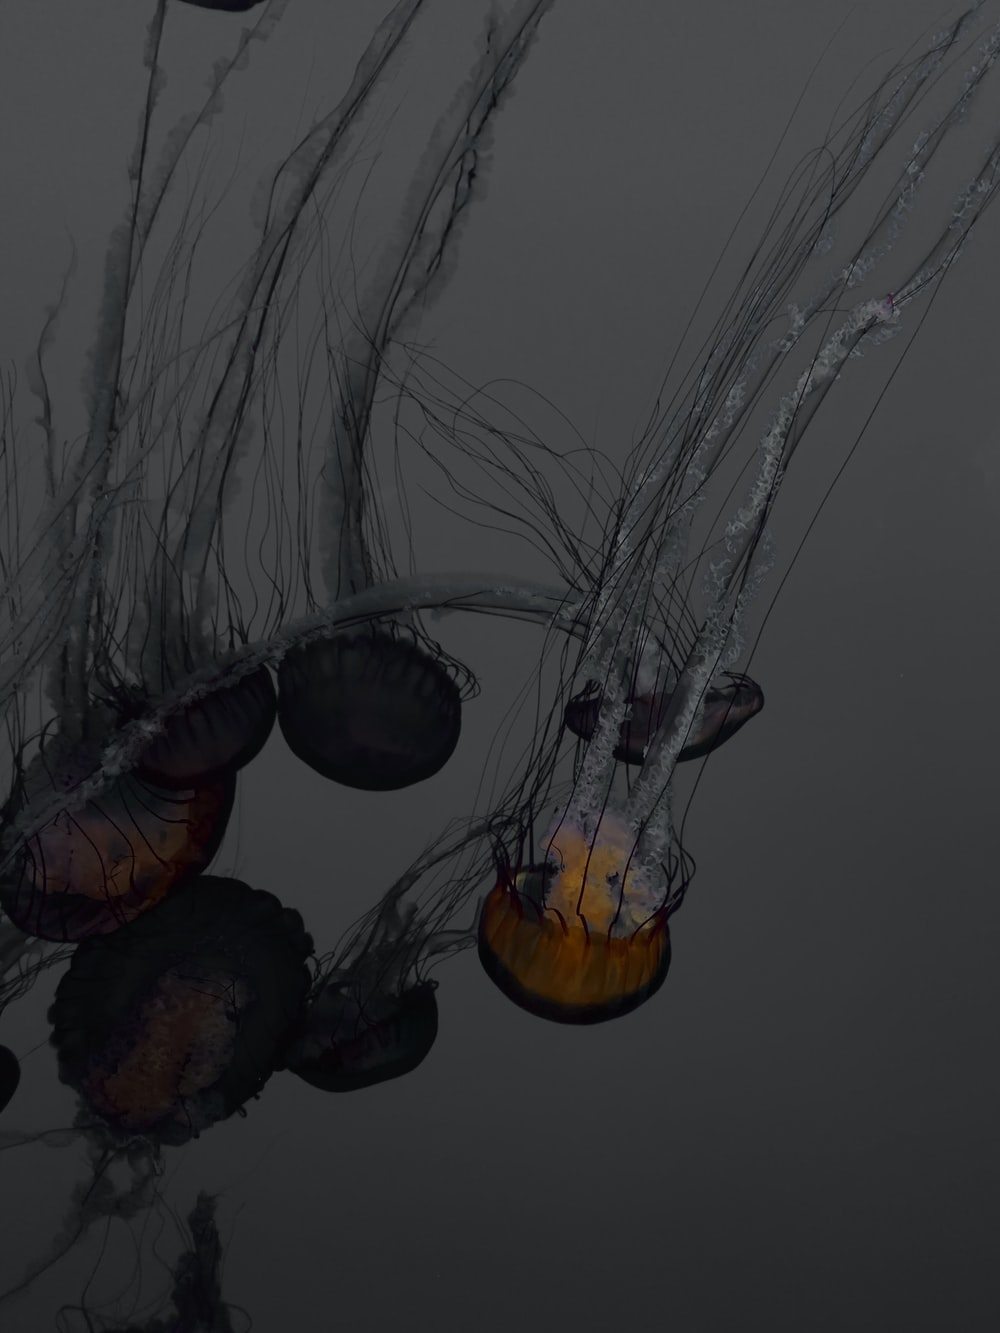 jellyfish illustration